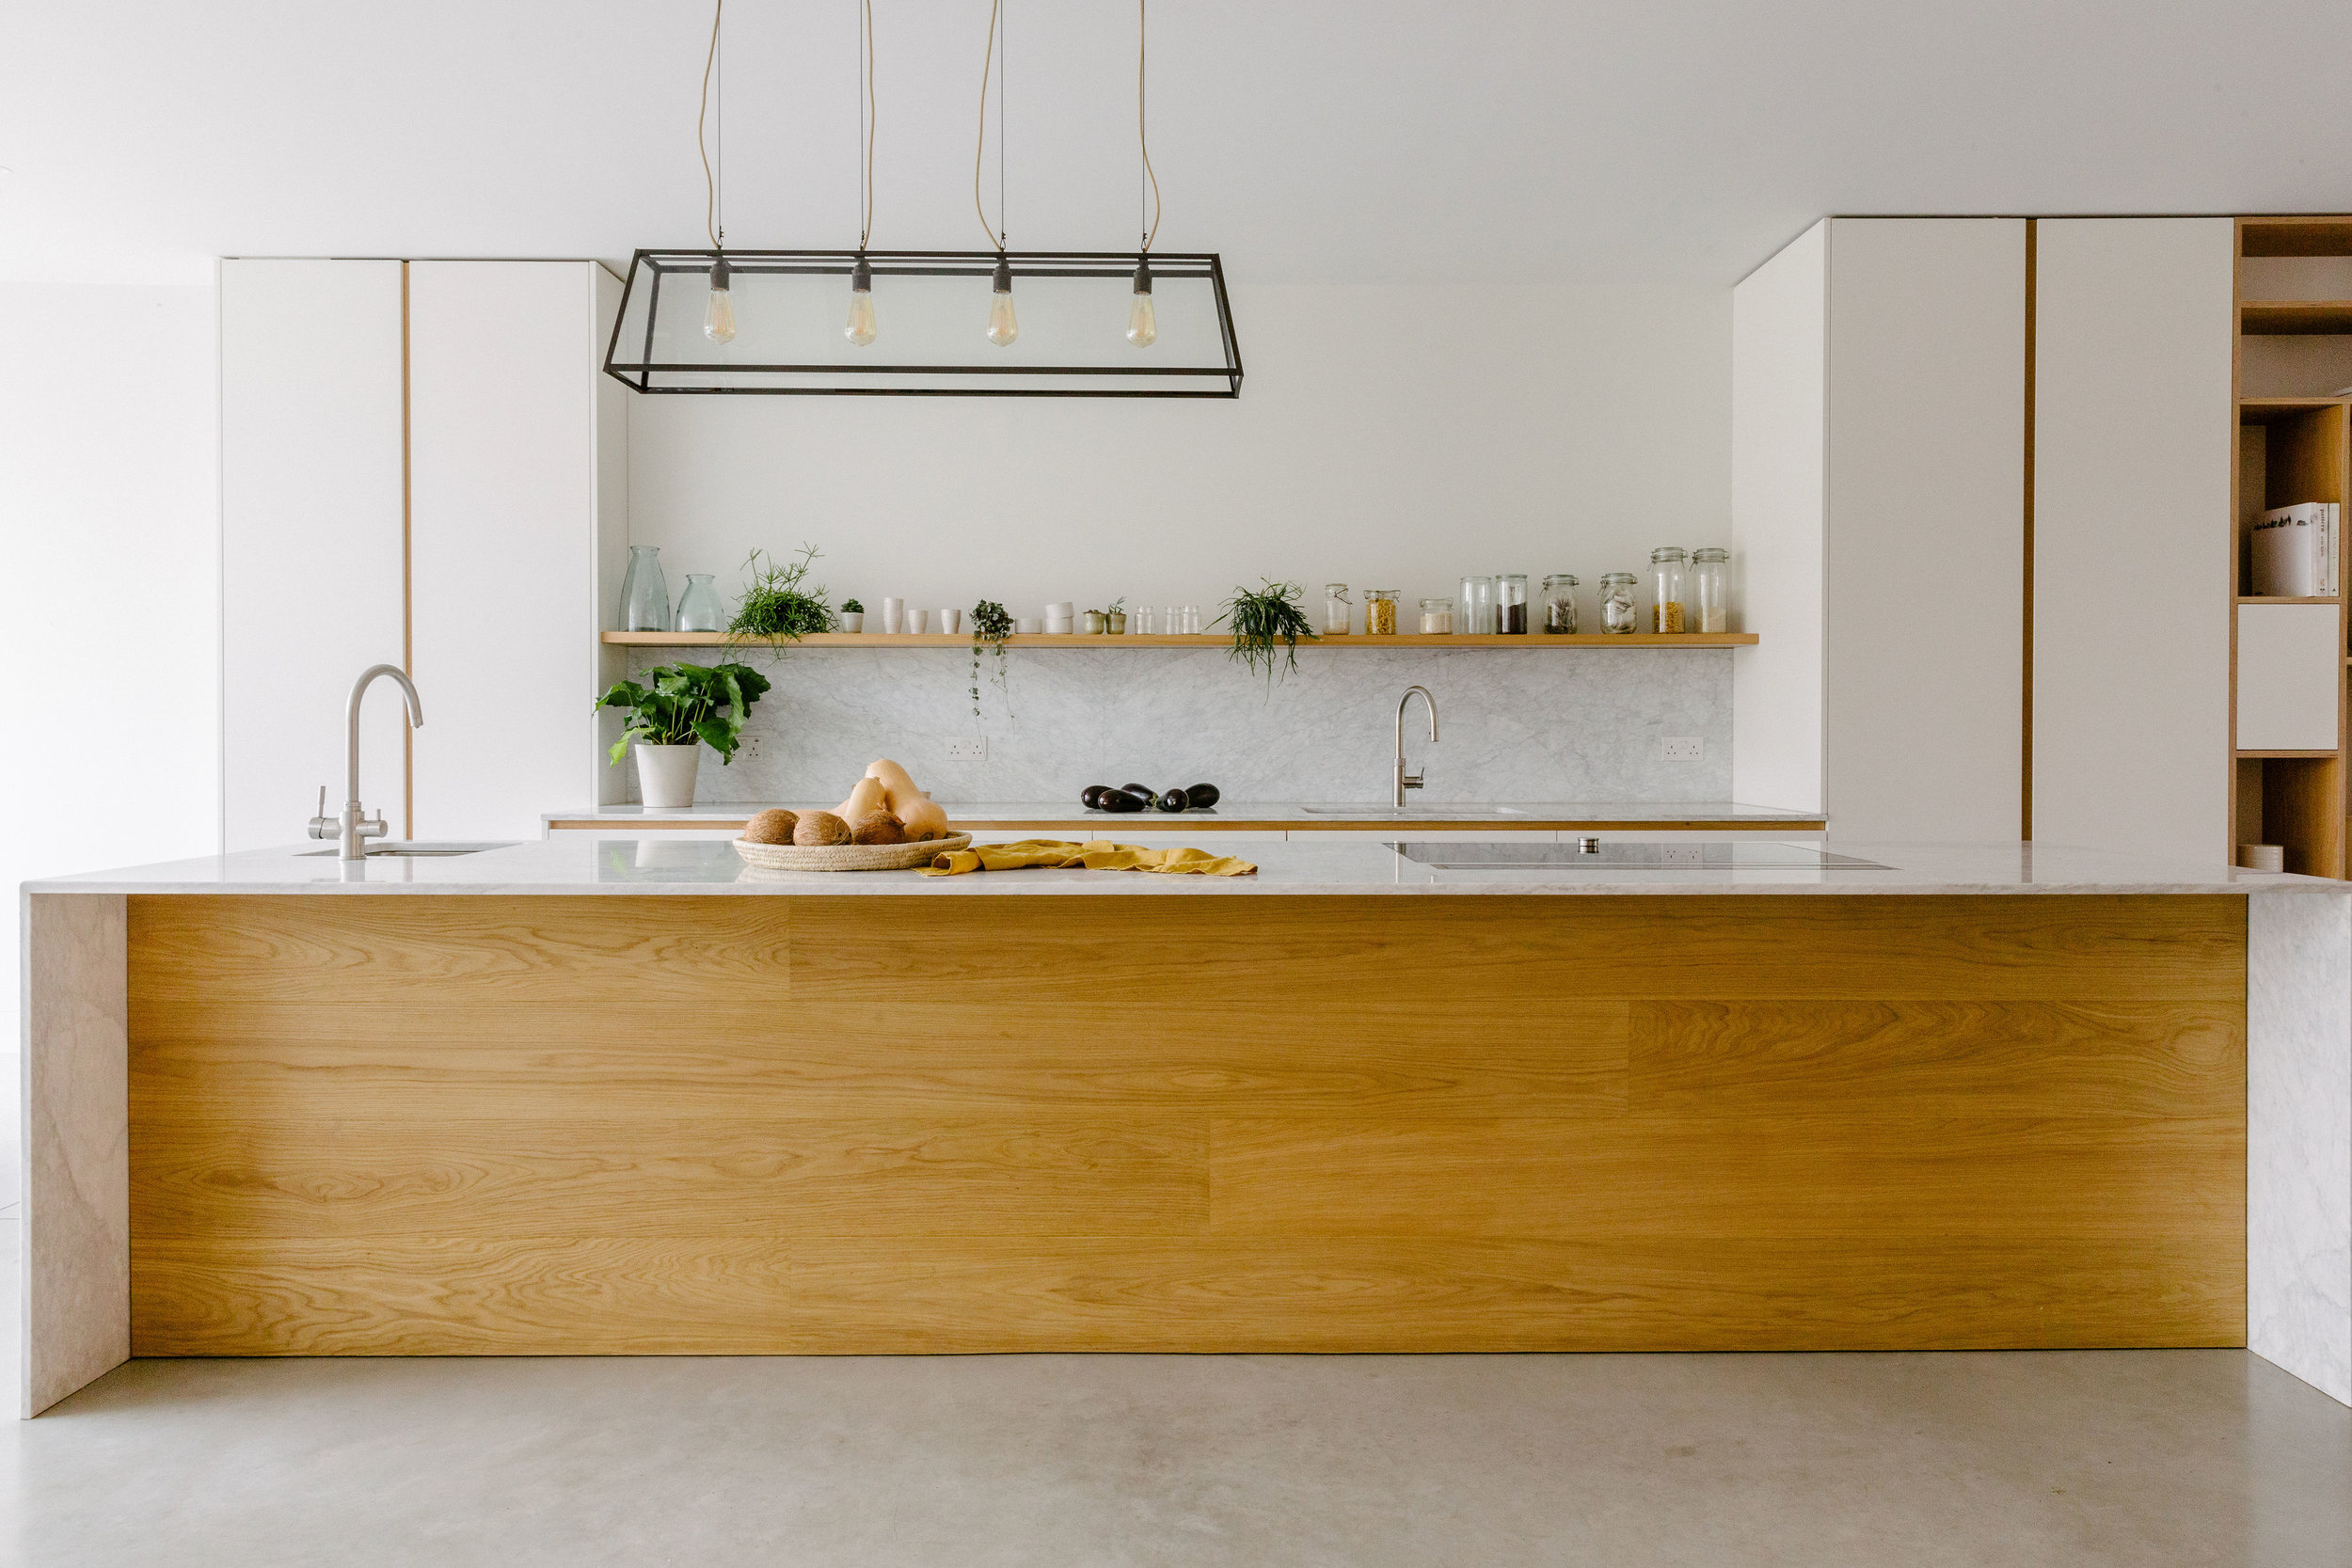 Bespoke kitchen white and oak